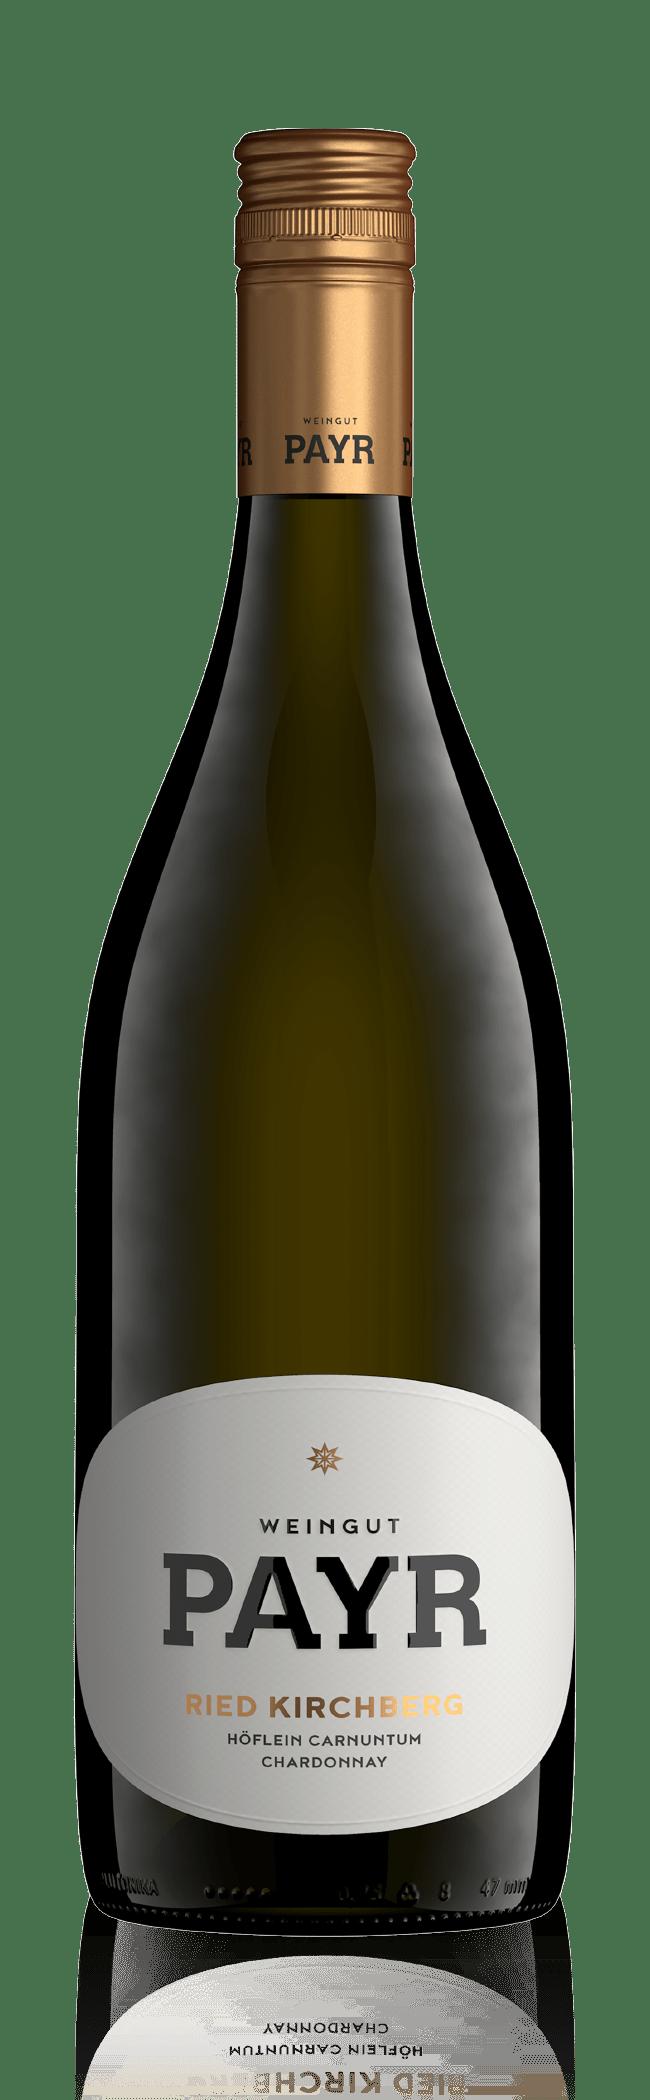 Weingut-Payr-Chardonnay-Kirchberg